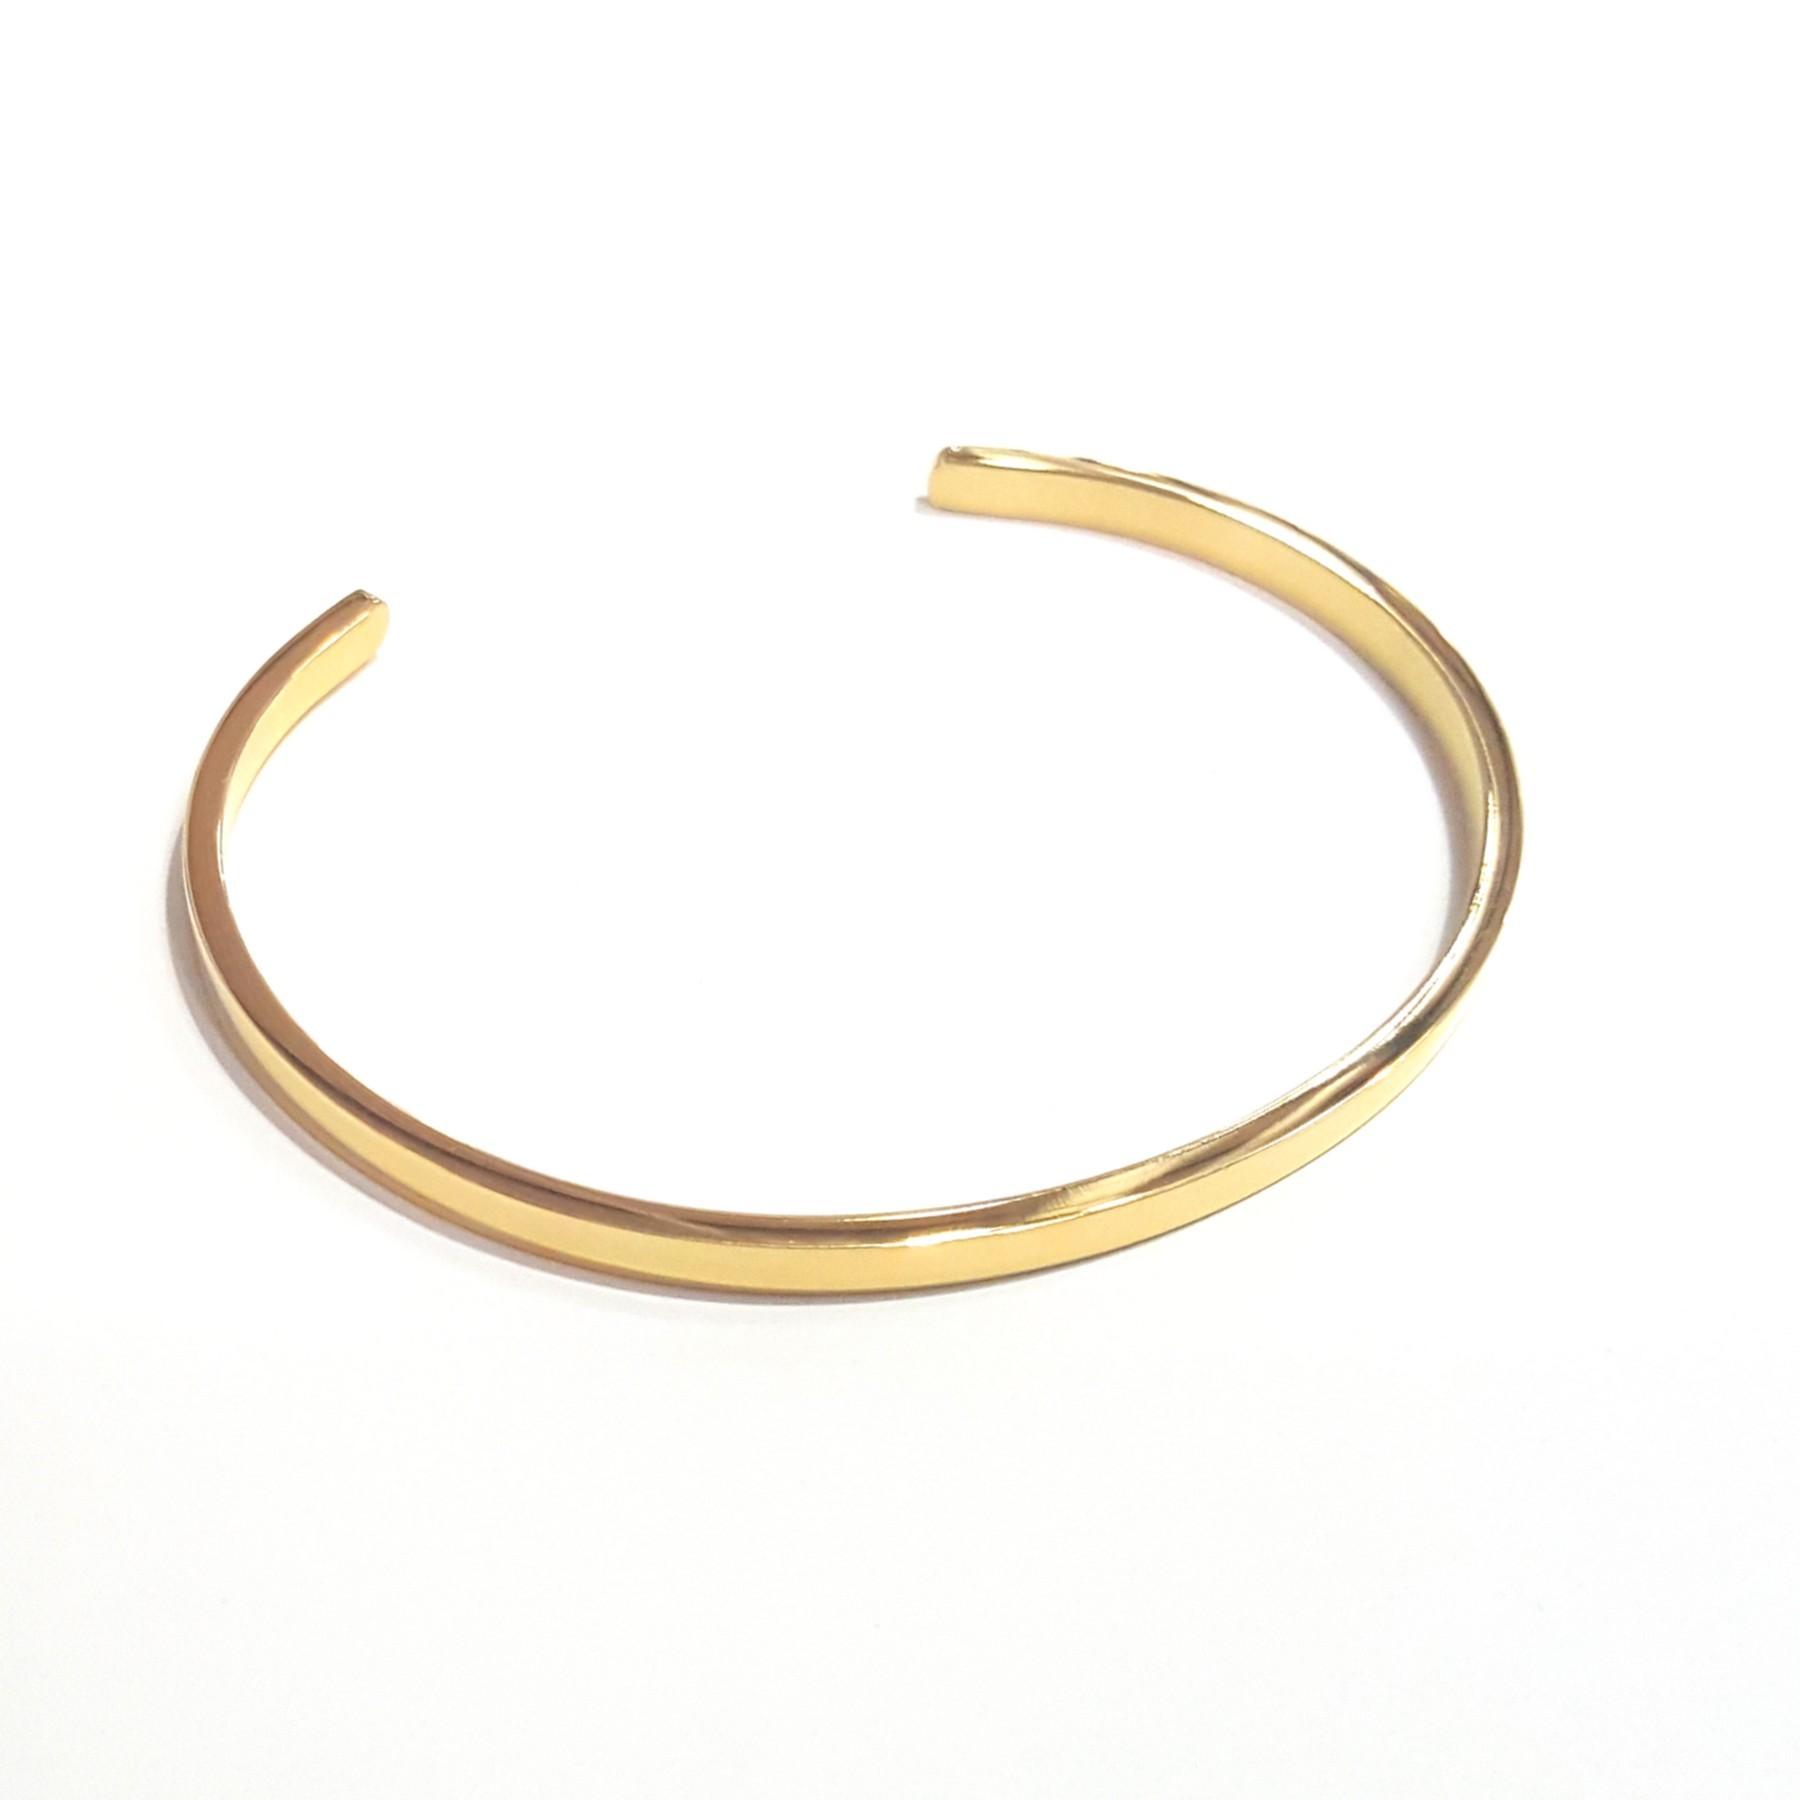 Jonc 3mm acier doré